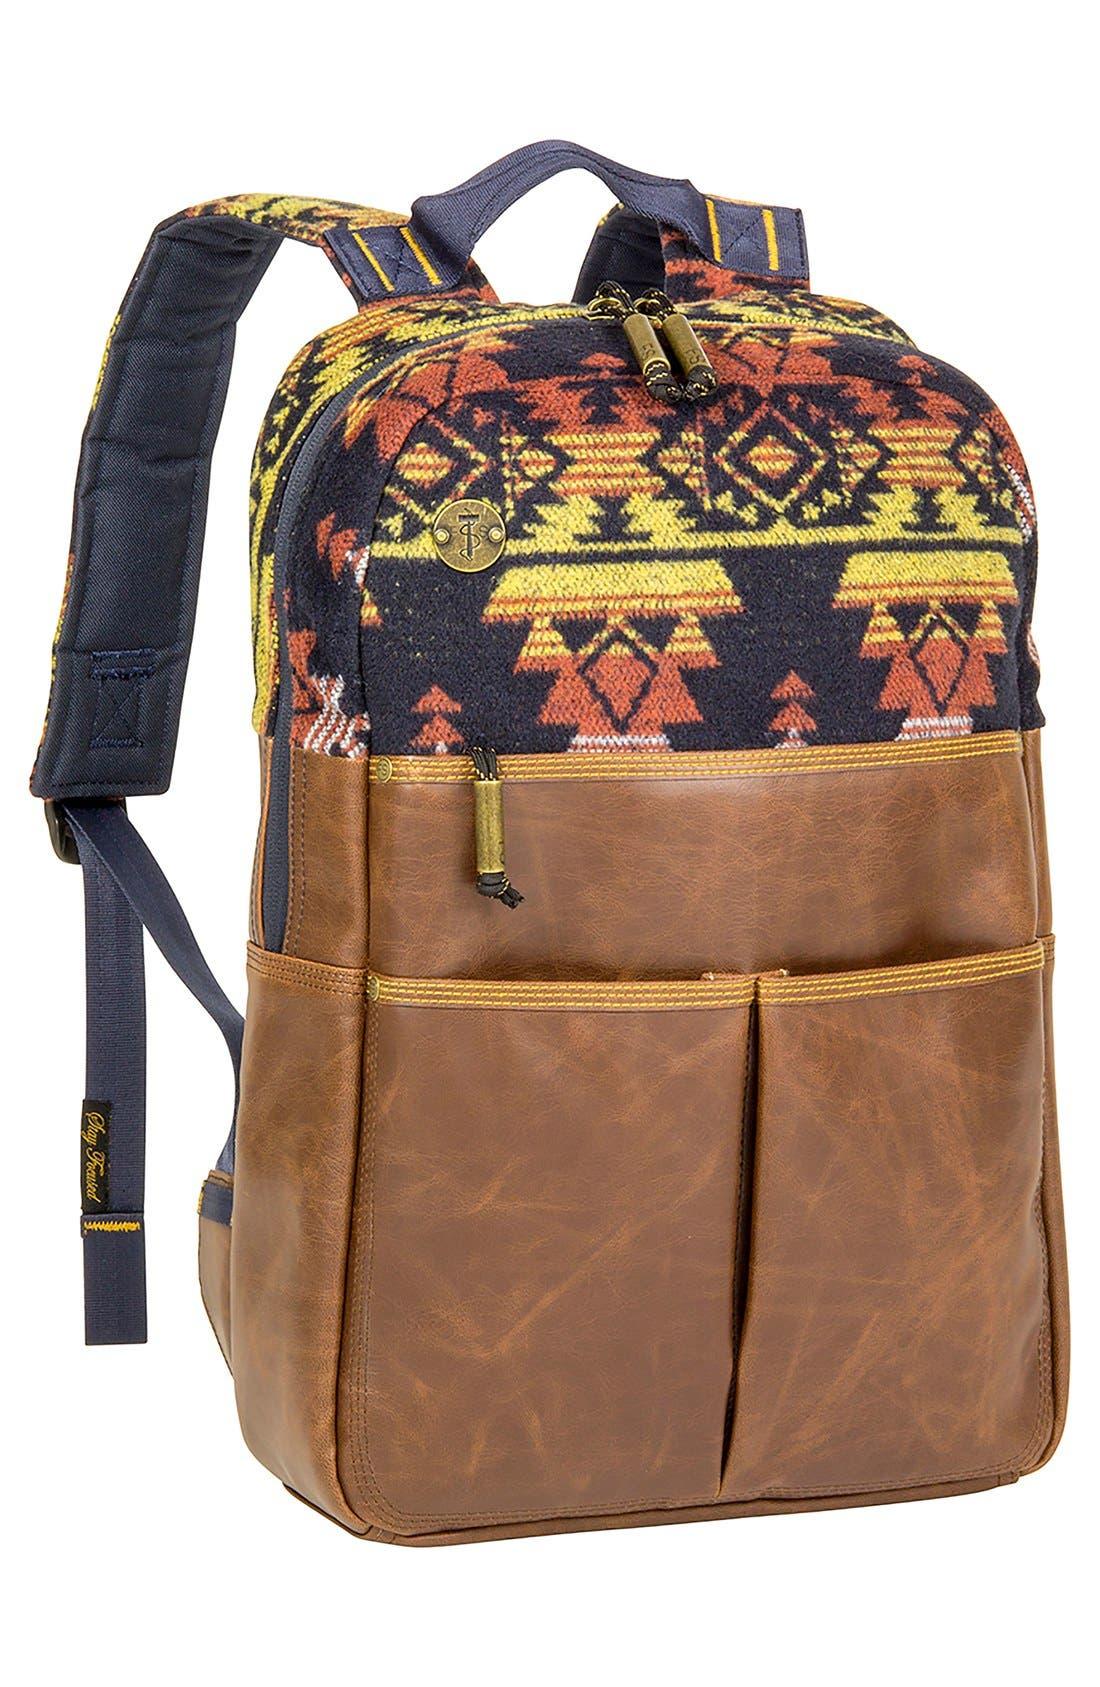 Alternate Image 1 Selected - Focused Space 'The Departure' Backpack